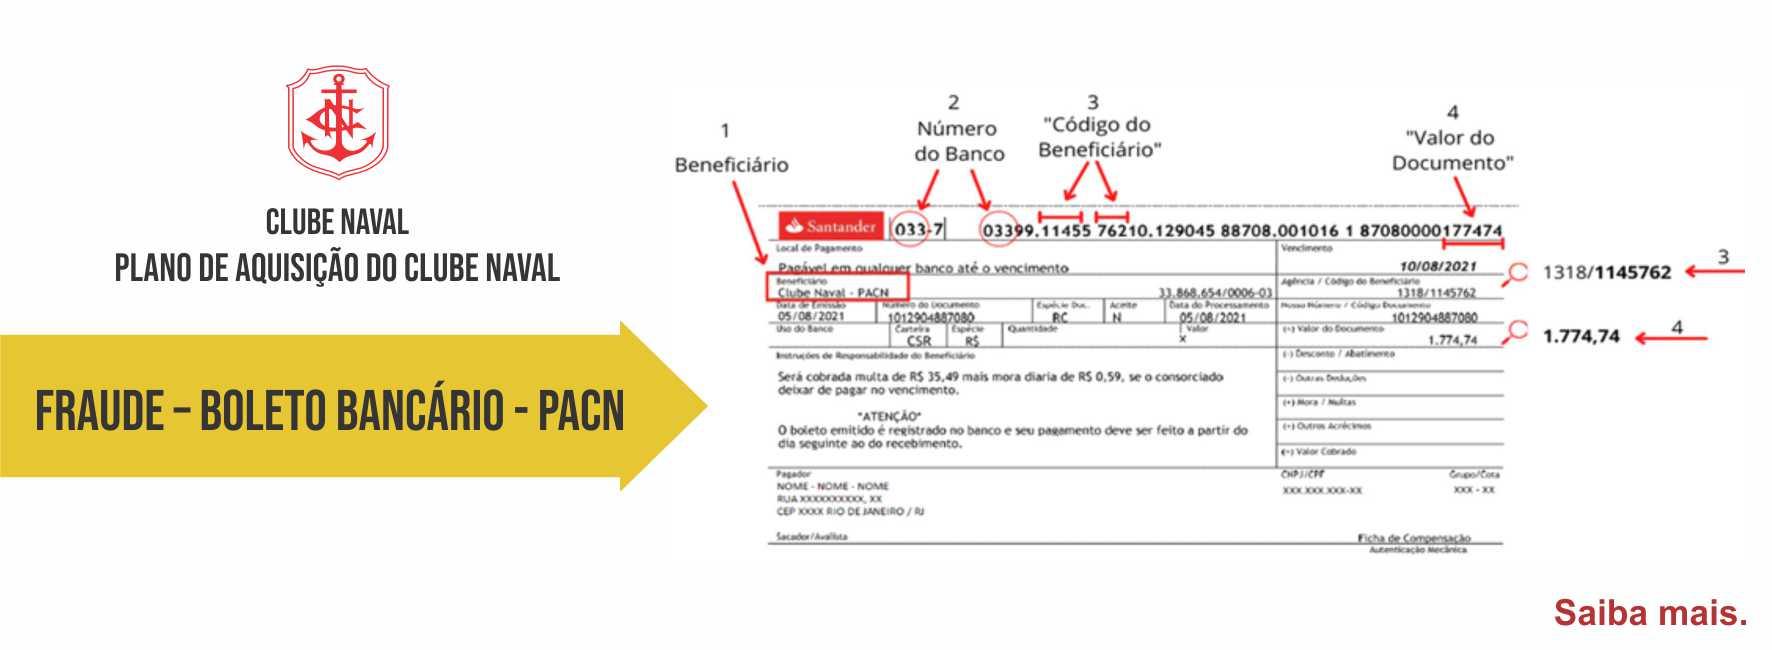 https://www.clubenaval.org.br/novo/?q=fraude-%E2%80%93-boleto-banc%C3%A1rio-pacn